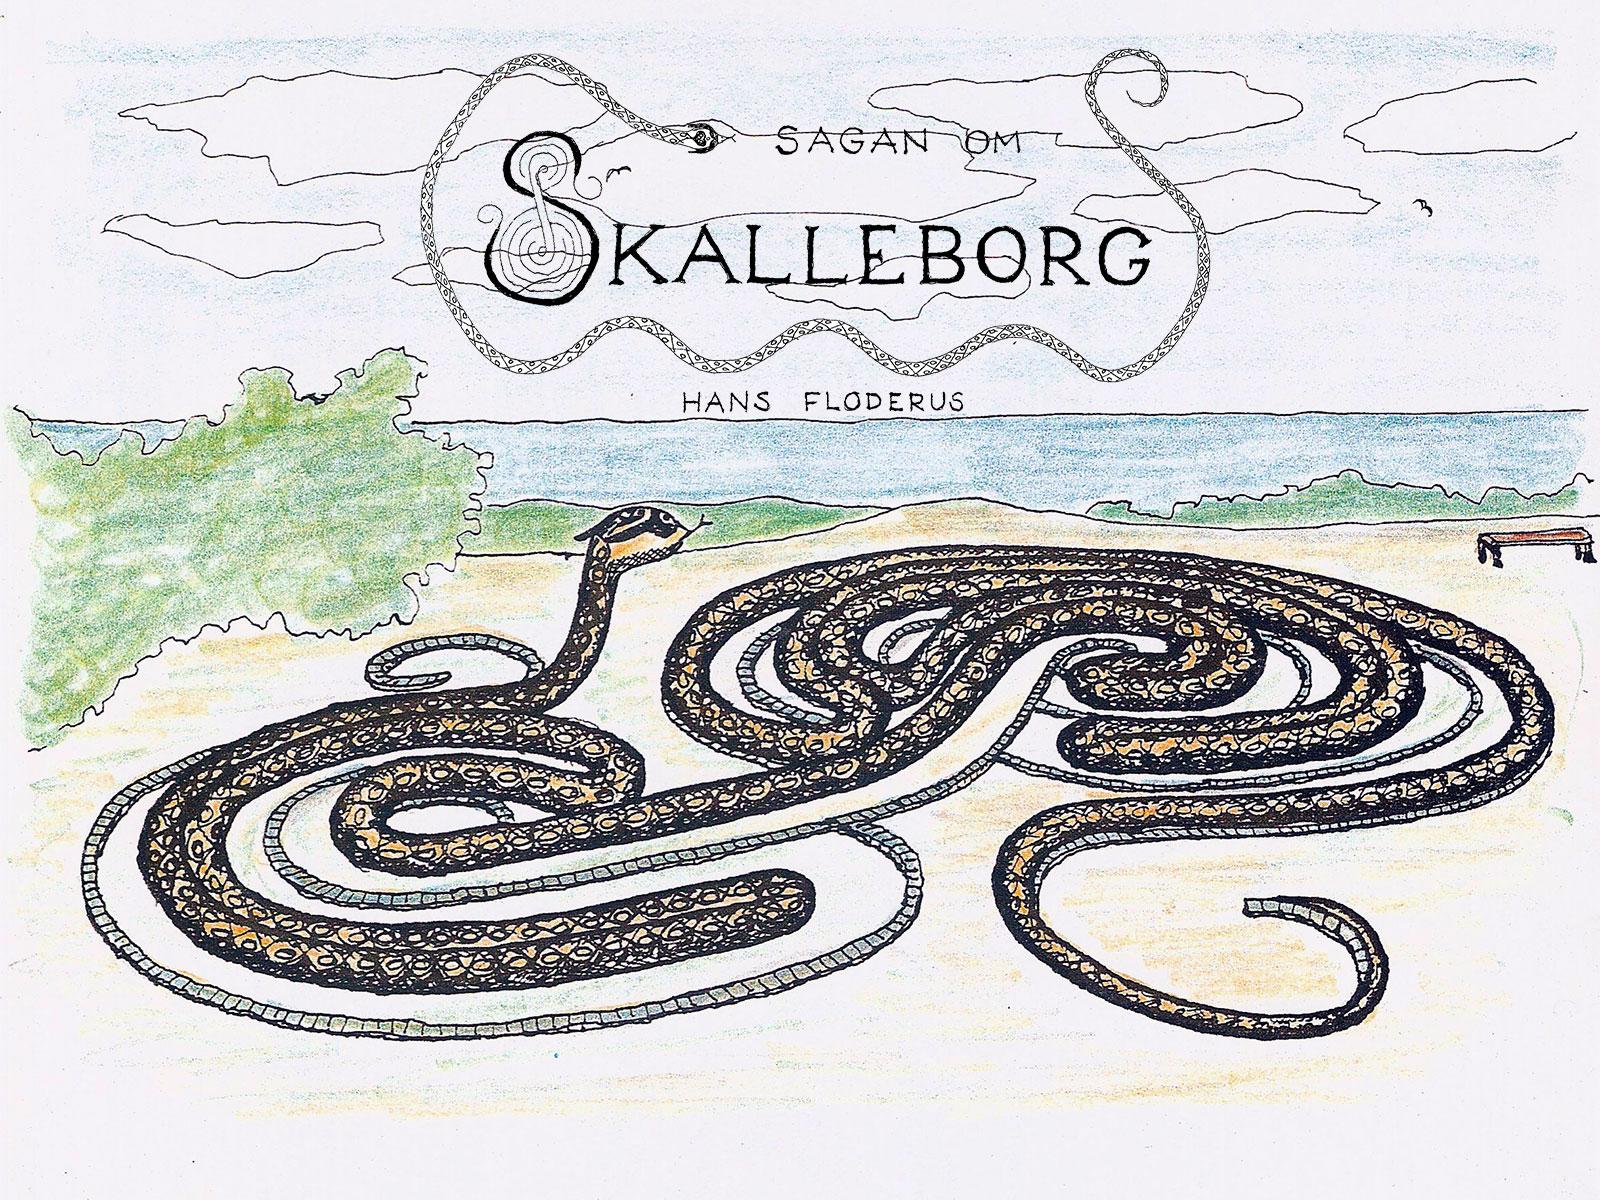 Sagan om Skalleborg